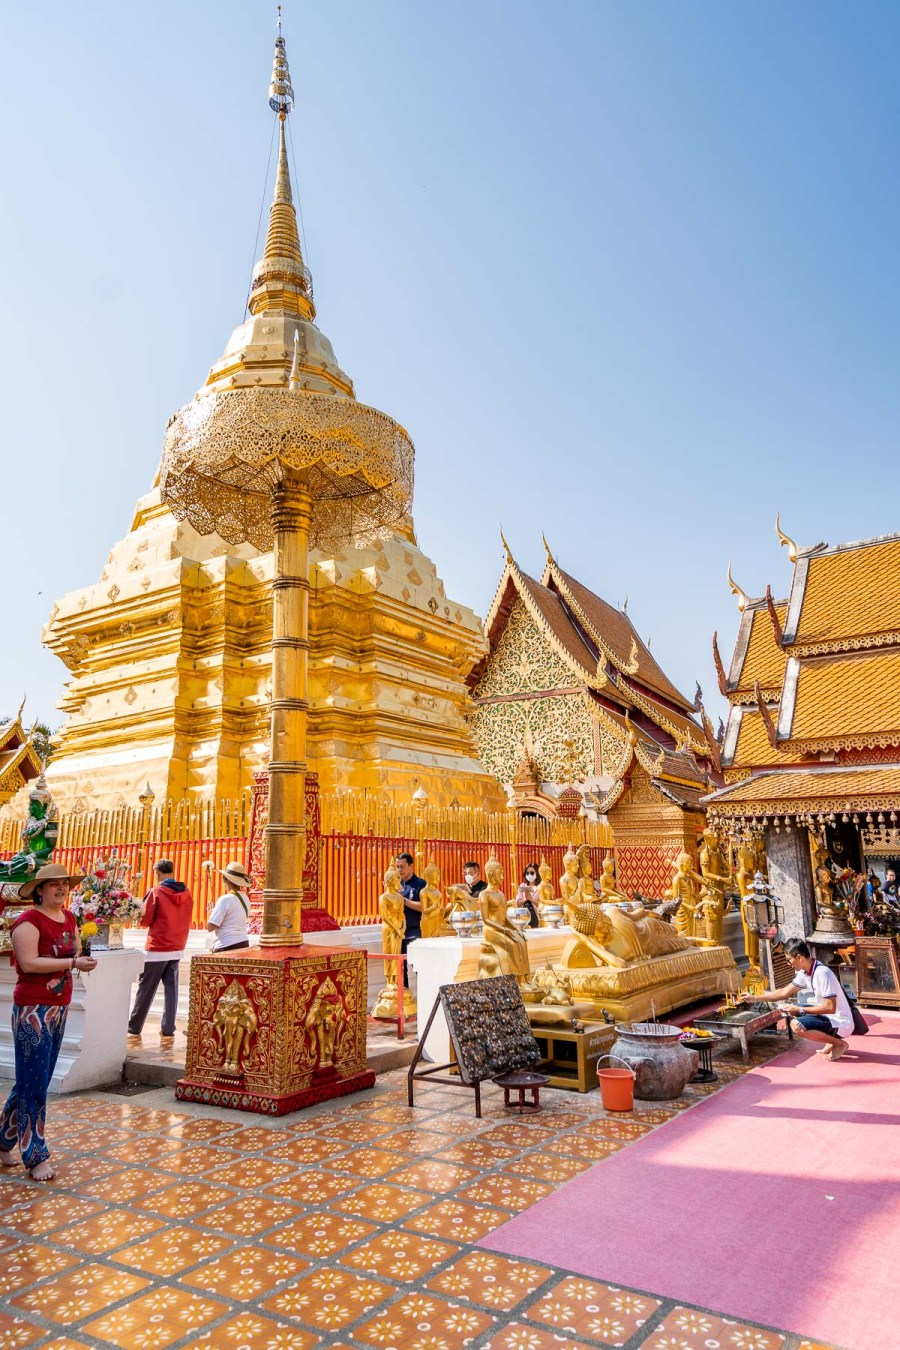 Beautiful golden temple at Doi Suthep in Chiang Mai